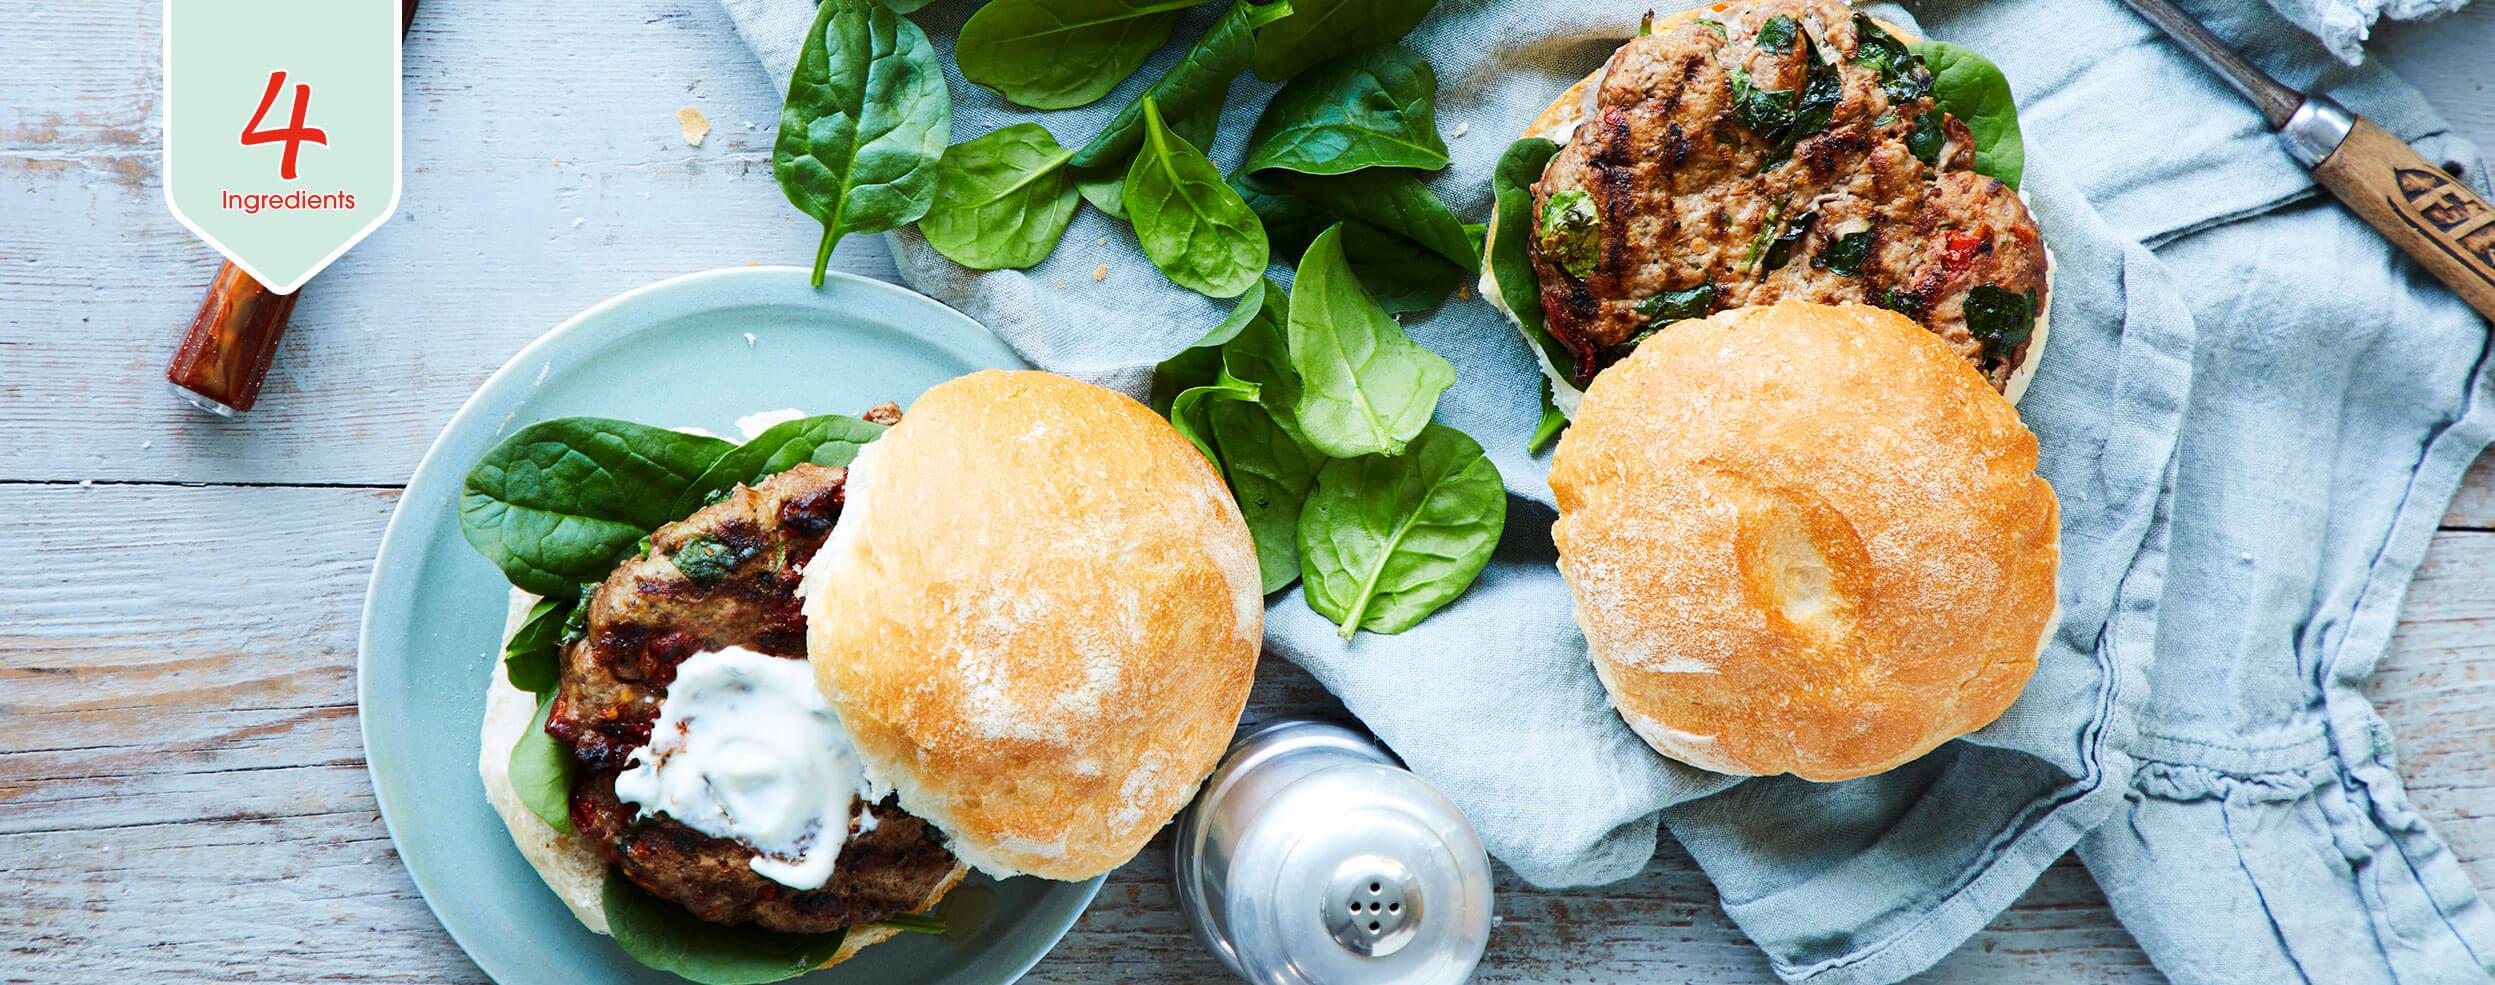 festive-burgers-beef.jpg